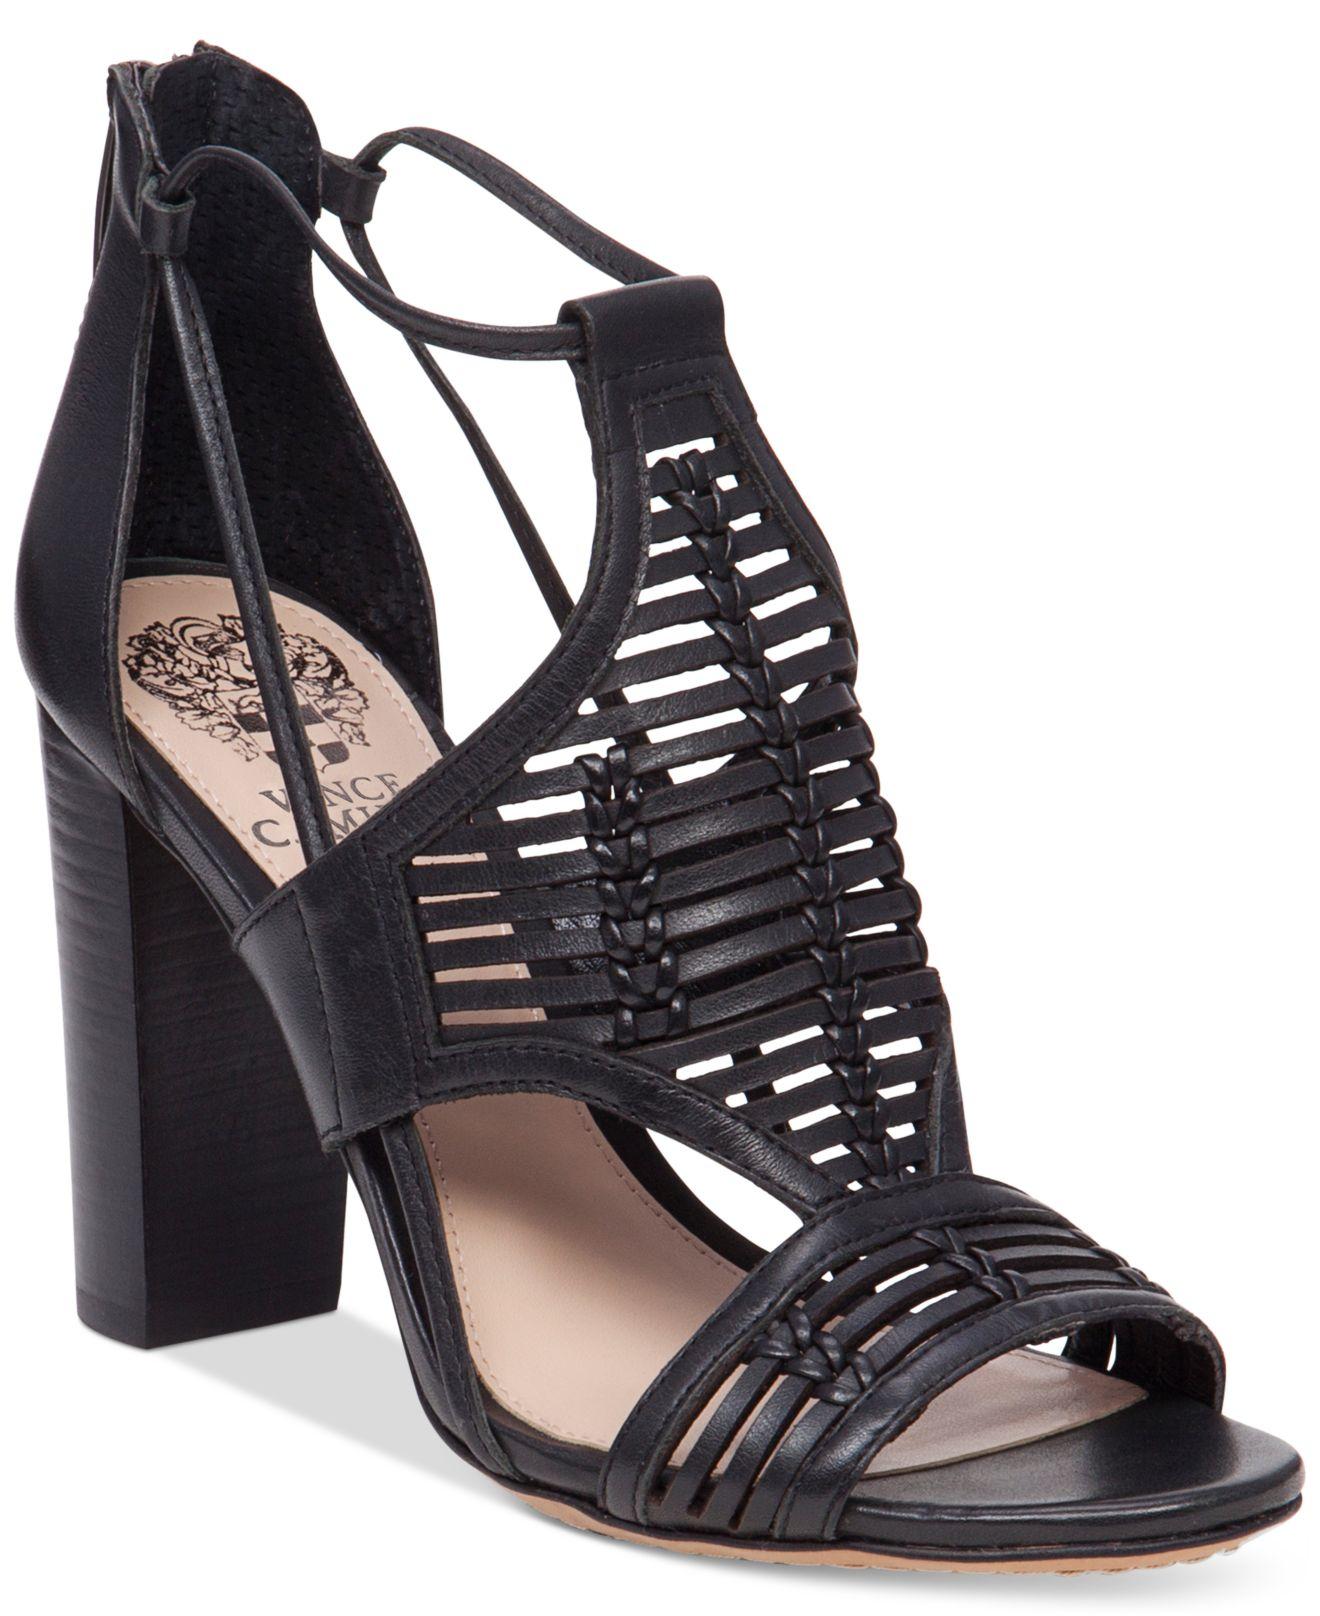 a2898a707ab Lyst - Vince Camuto Ceara Huarache Block-heel Dress Sandals in Black